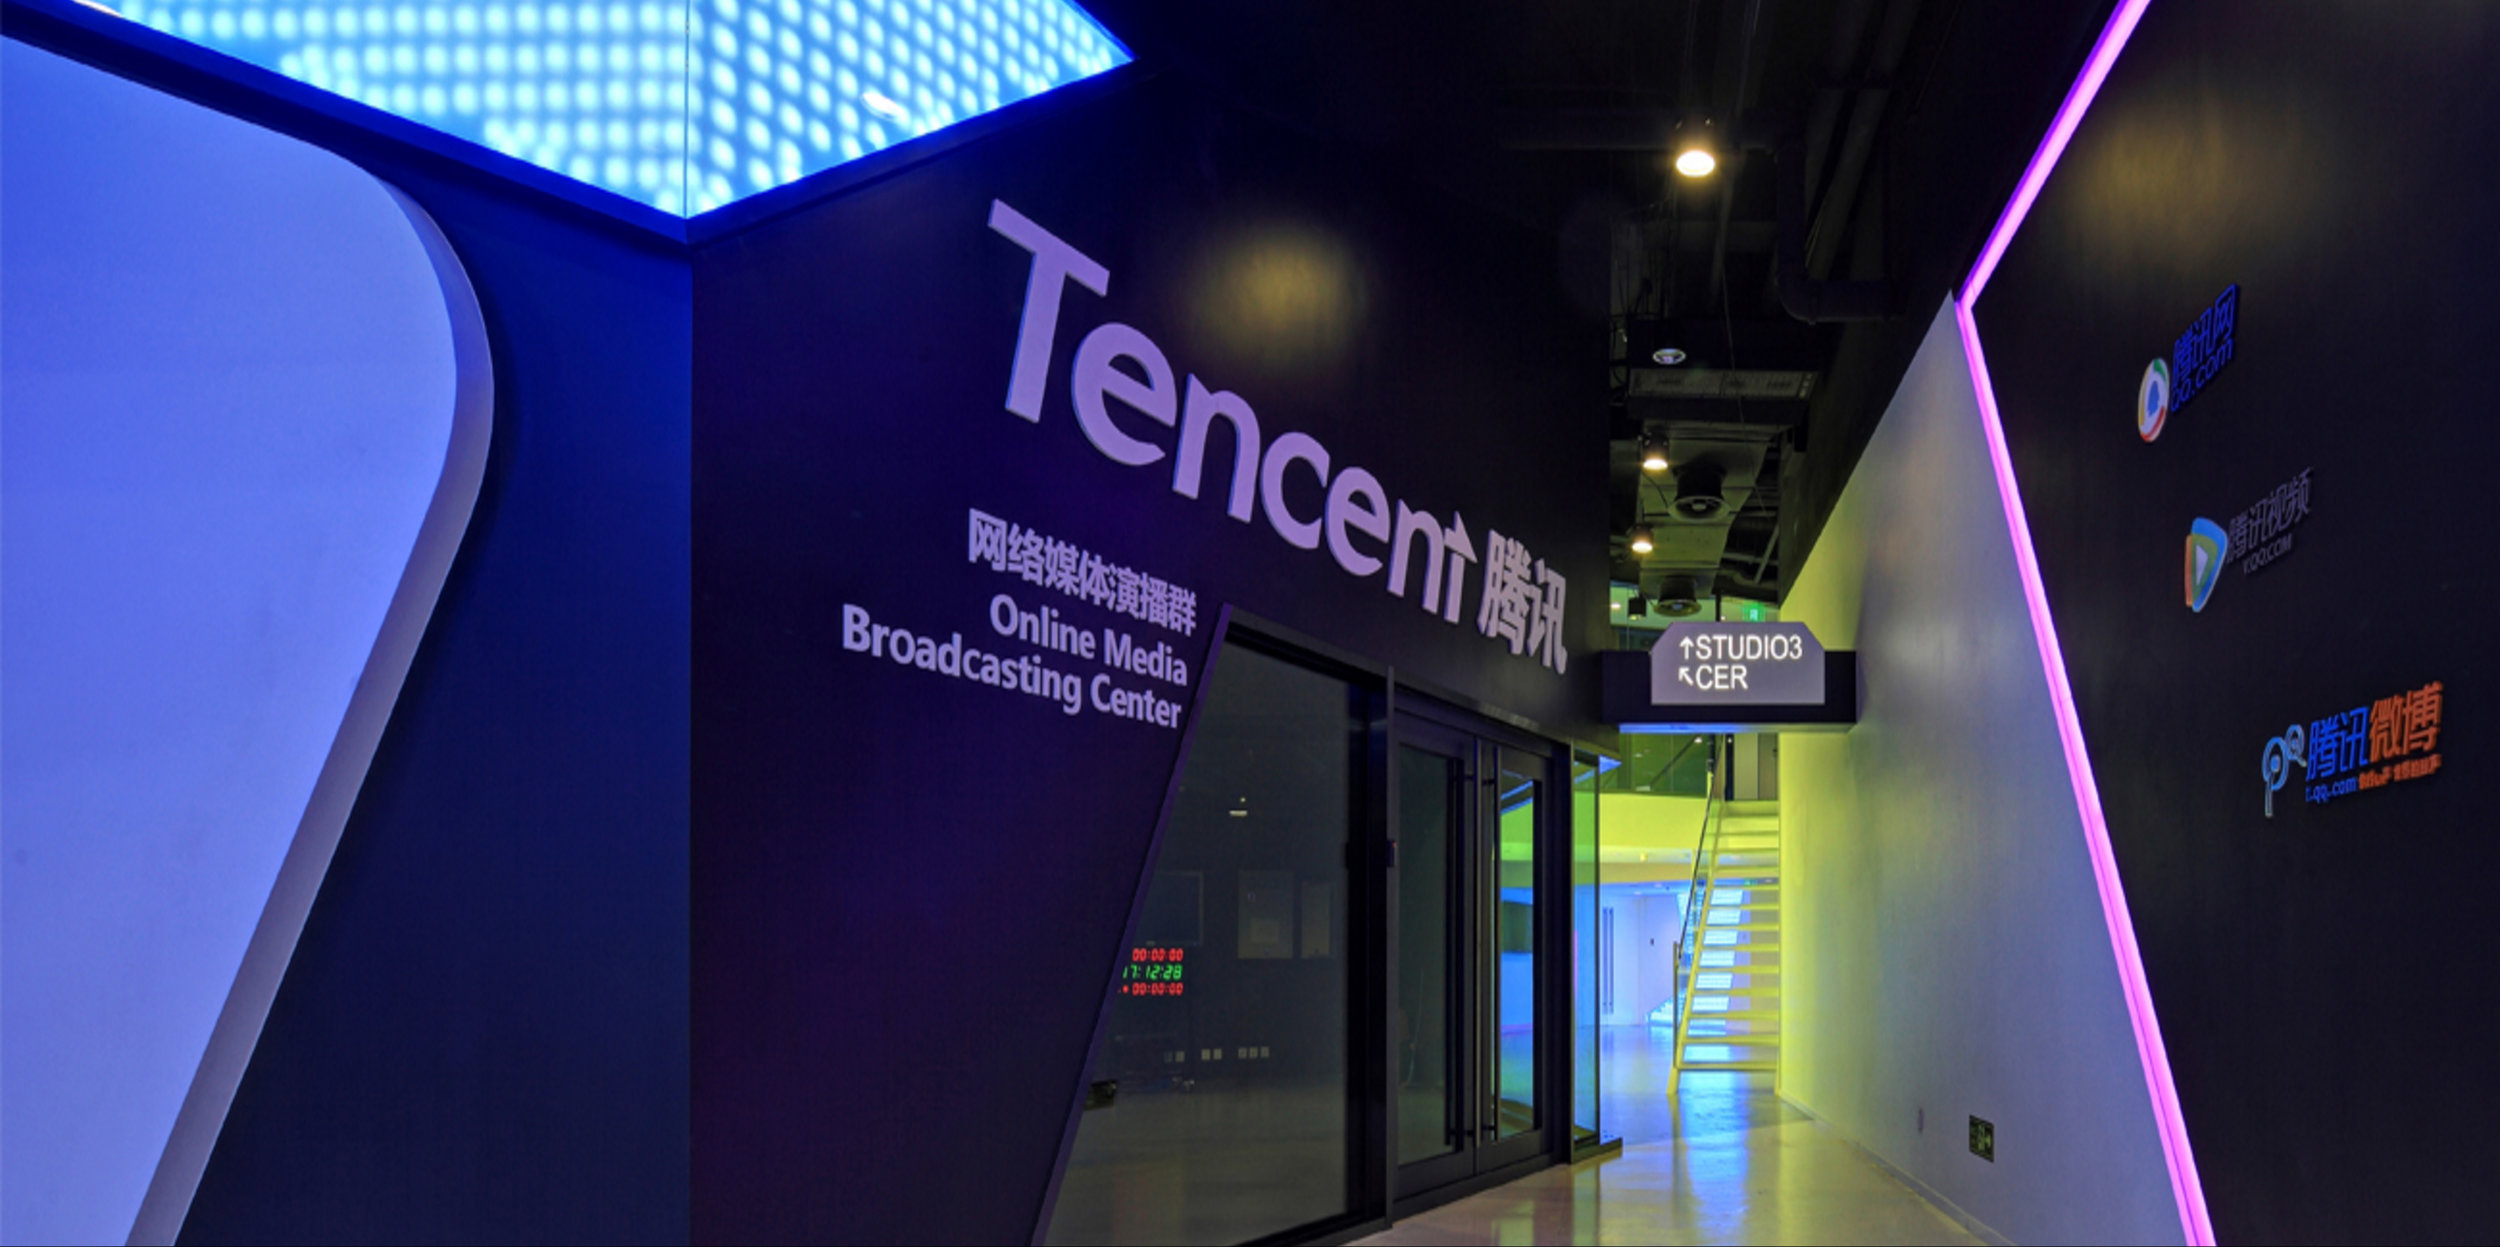 Tencent_02.jpg